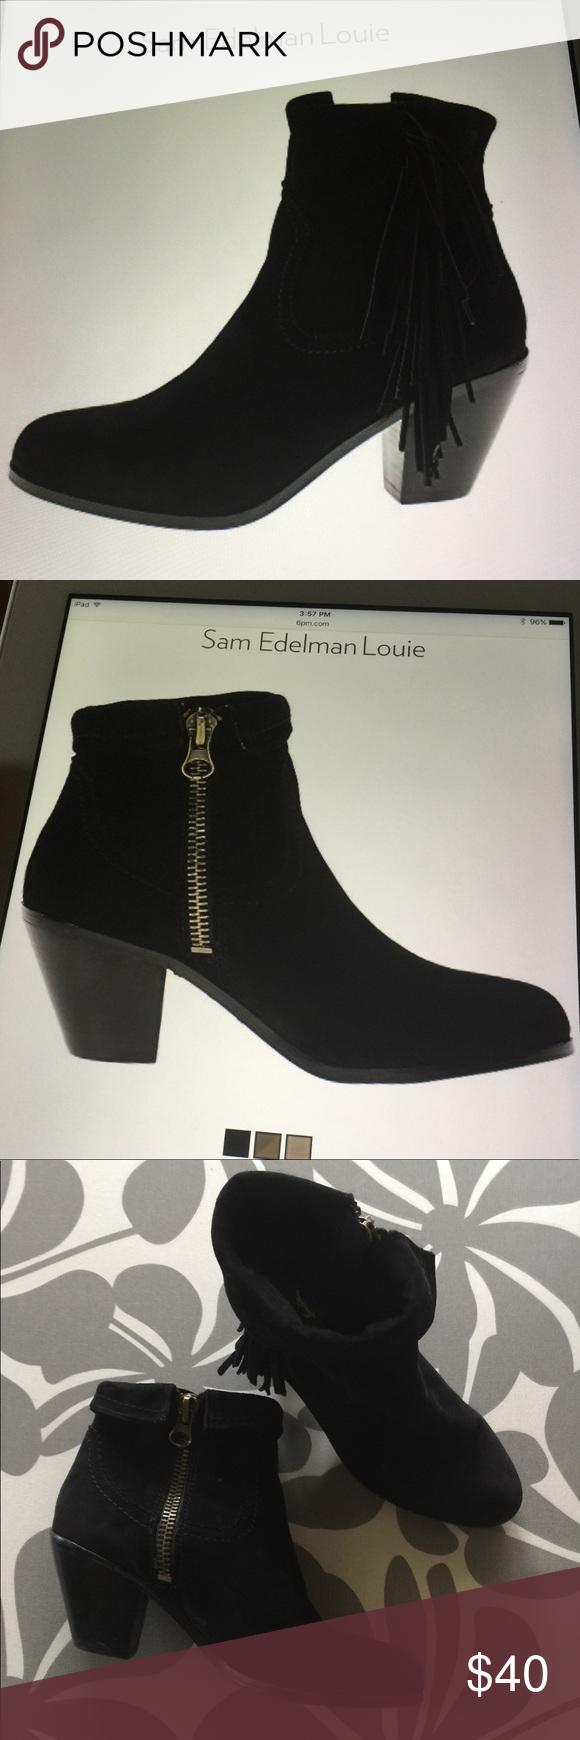 1e6dbbb95 Sam Edelman Louie fringed bootie